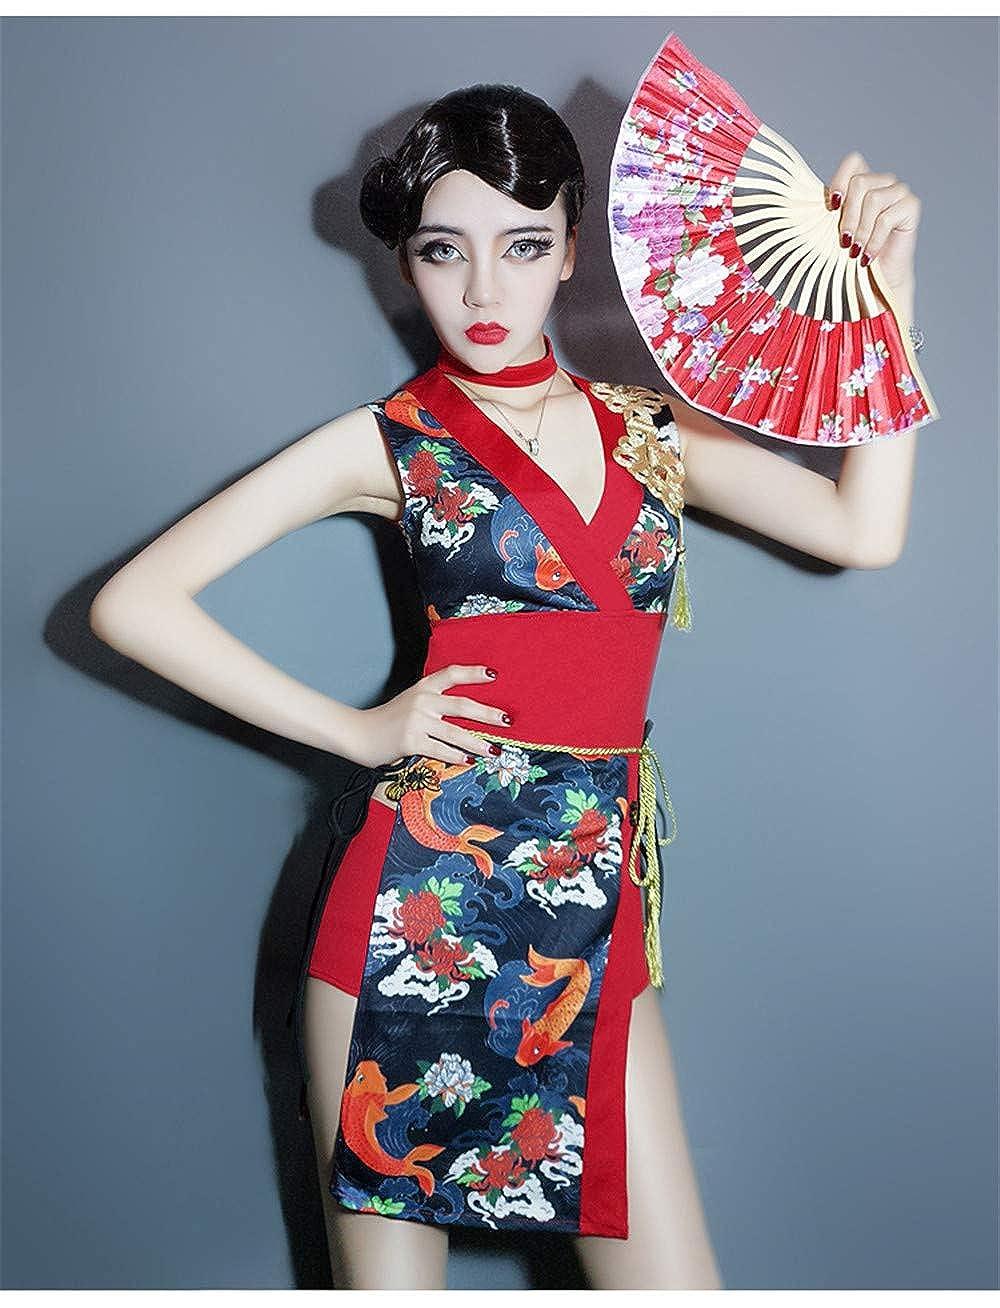 Amazon.com: COSMUSE Japanese Geisha Kimono Dress Ninja ...